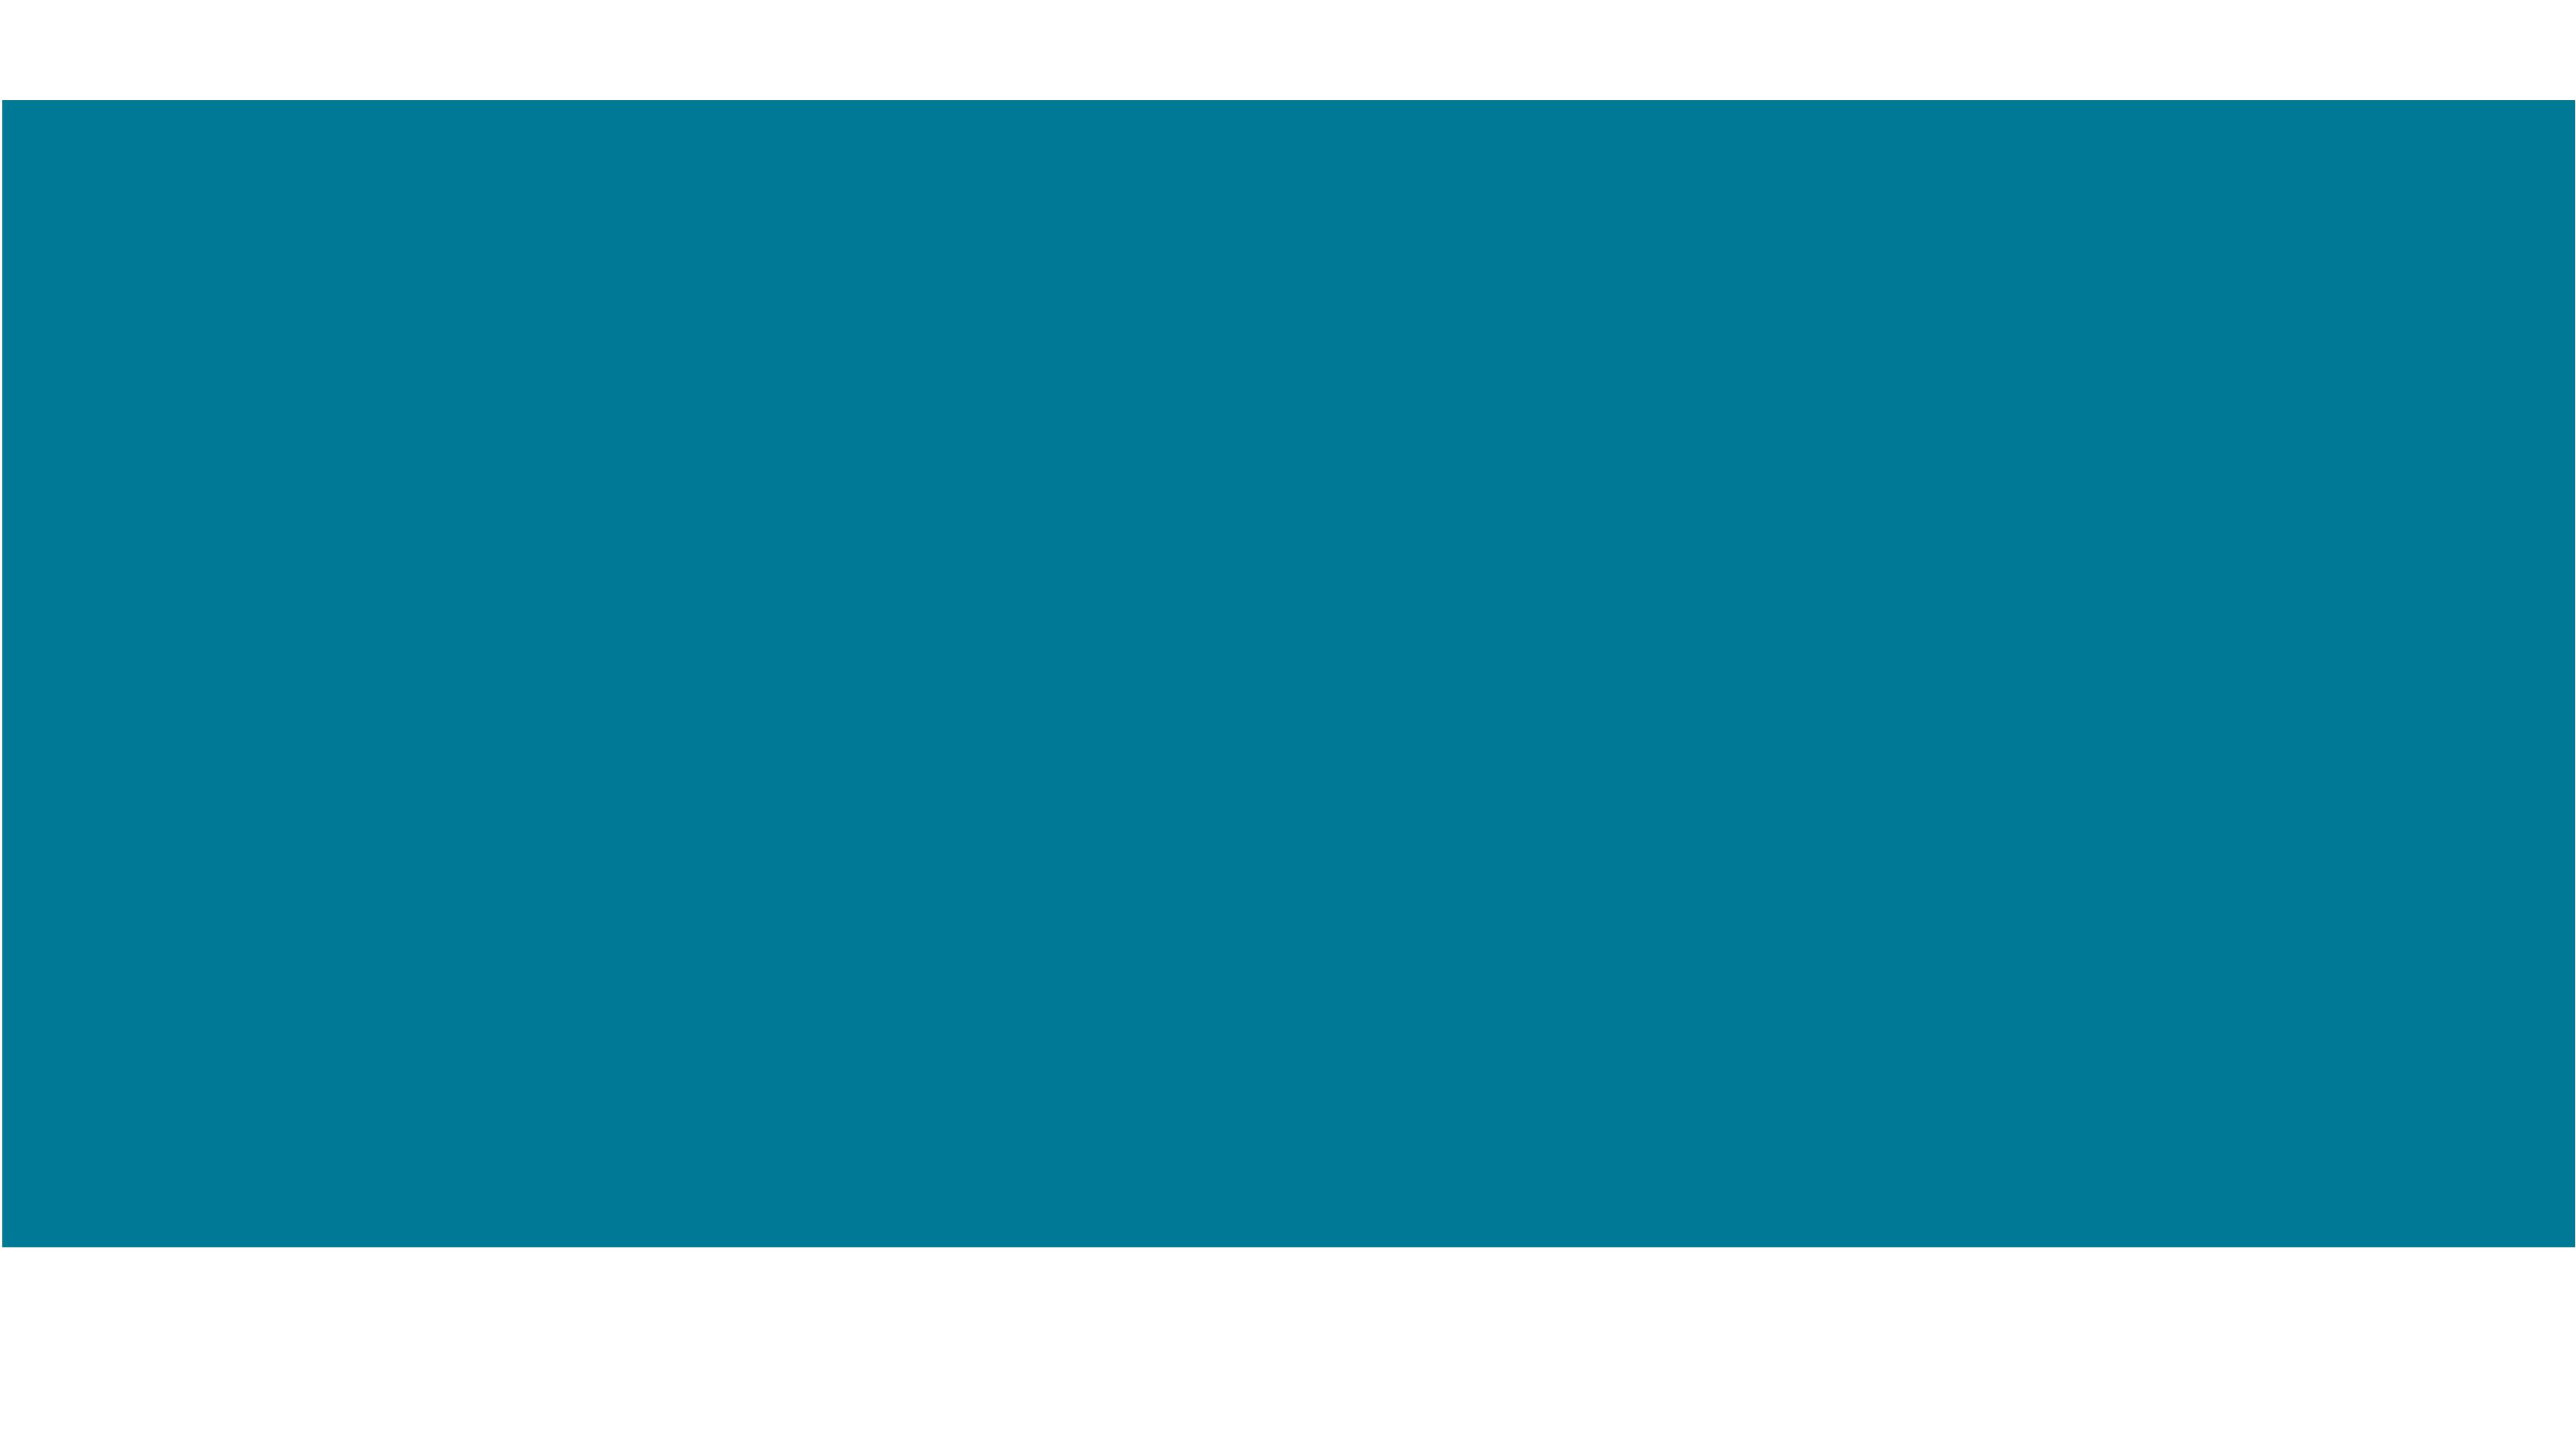 l-agence-d-urbanisme-de-la-region-grenobloise